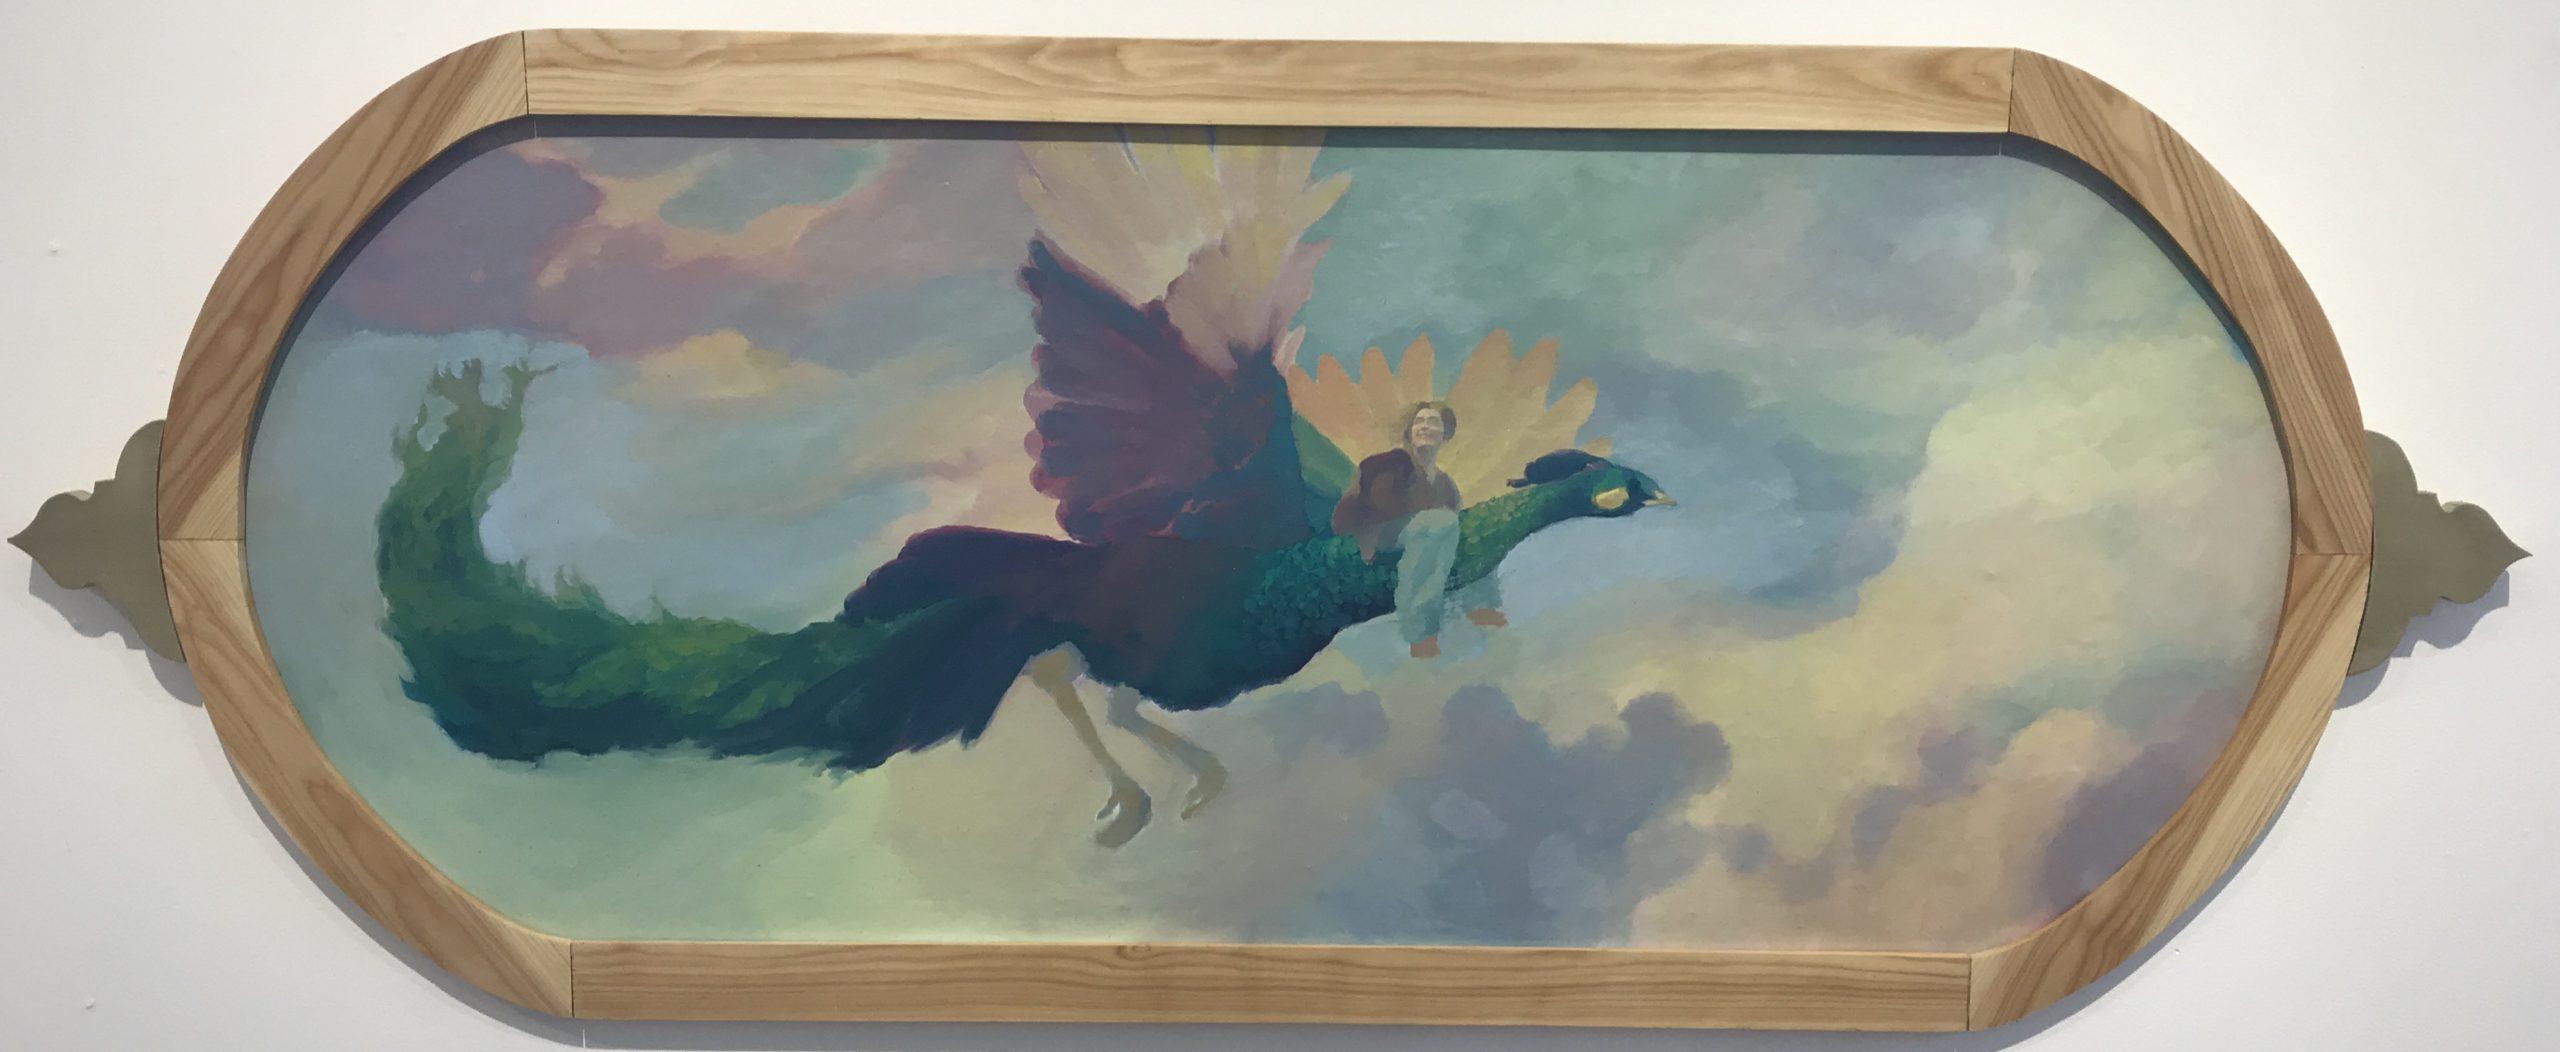 Anna Vogel<br>Flight of the Peacock    $300